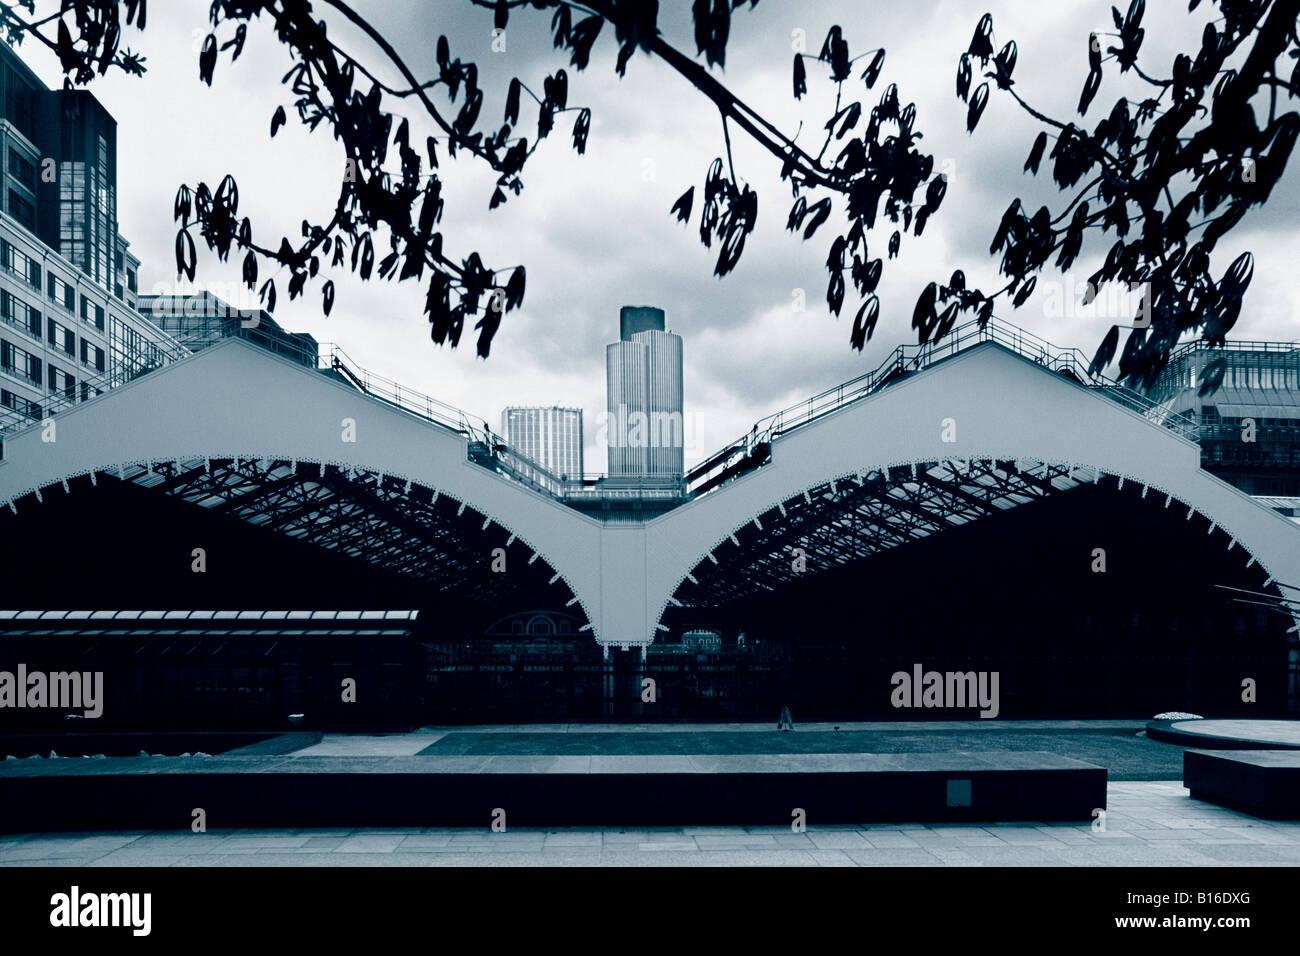 Liverpool Street railway station, Broadgate, London - Stock Image